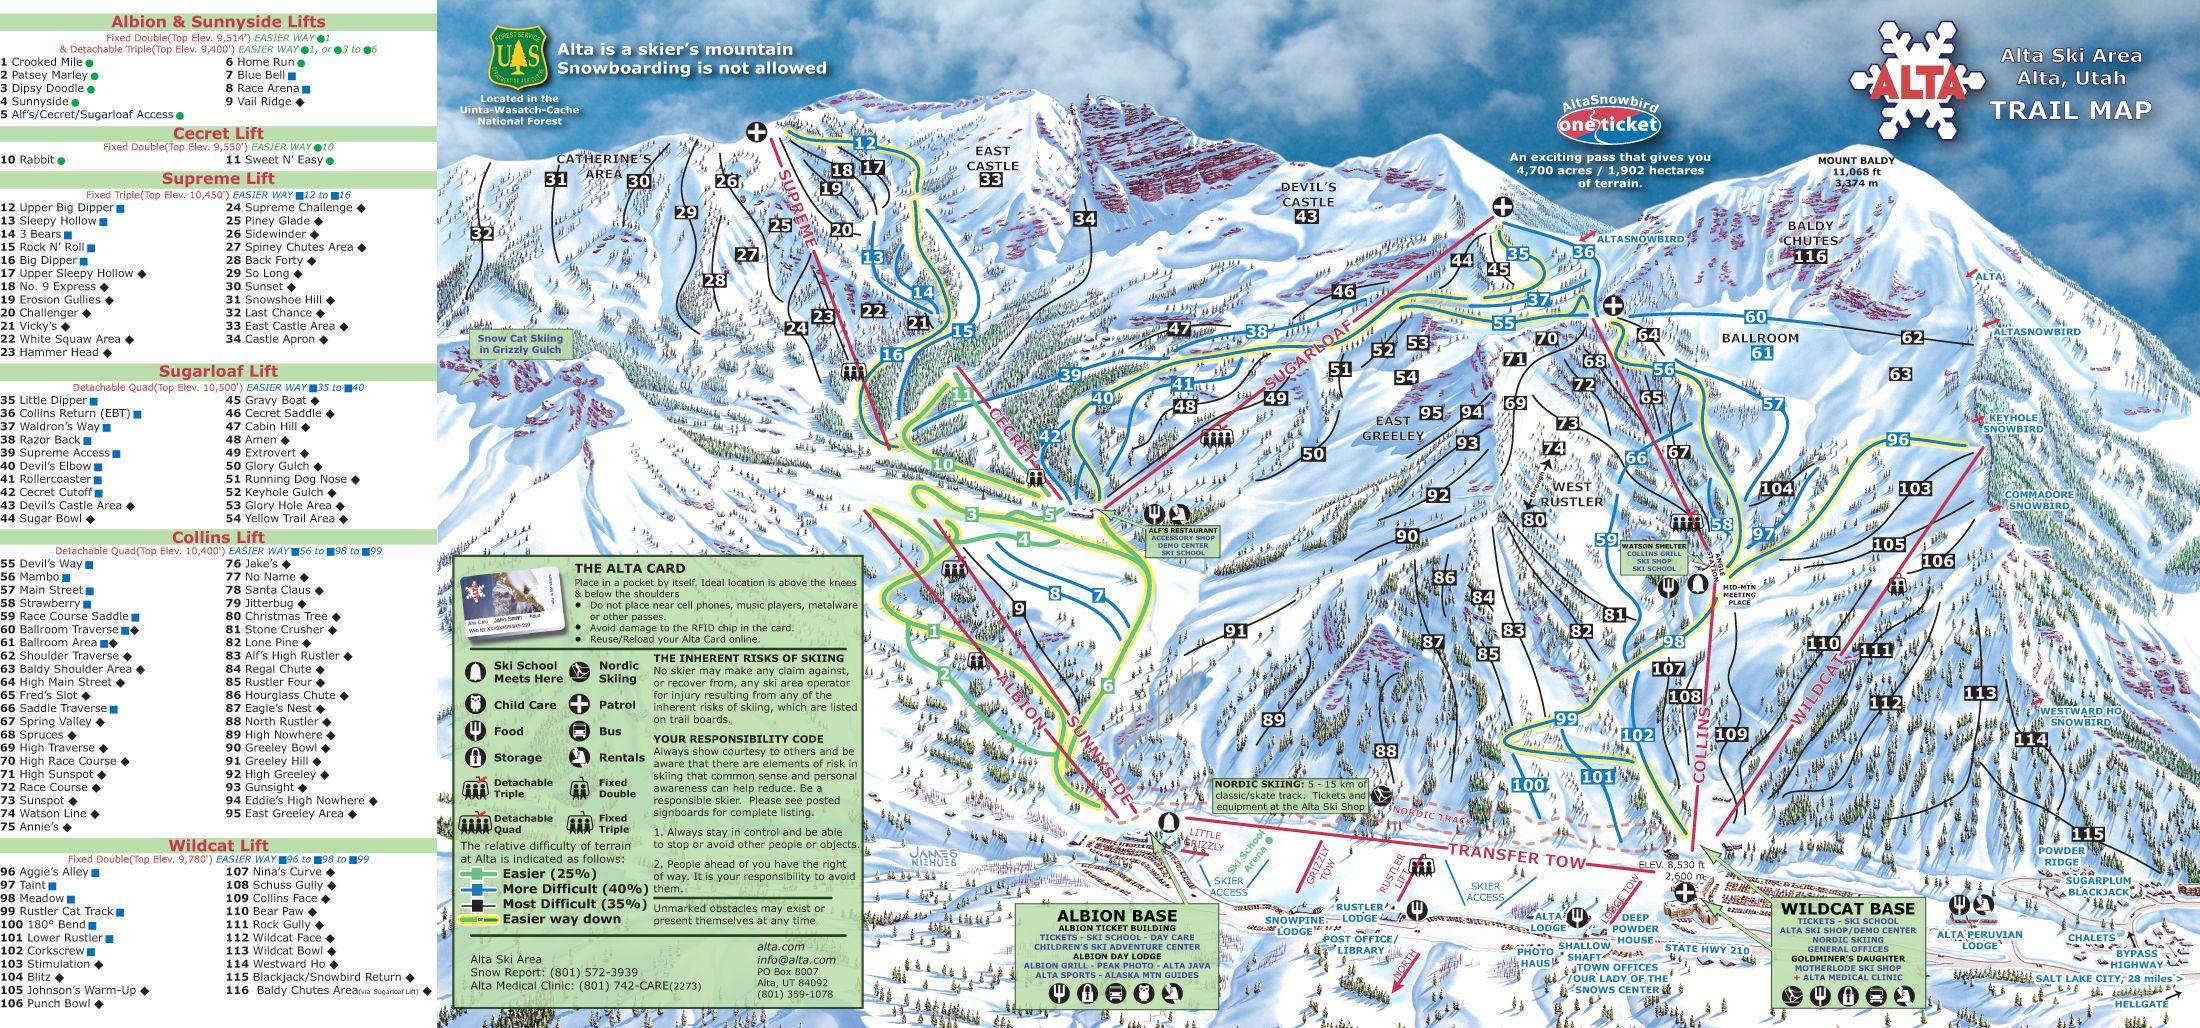 Bromley Mountain Peru VT Trail Map Skiing Pinterest Trail Maps - Mammoth mountain trail map